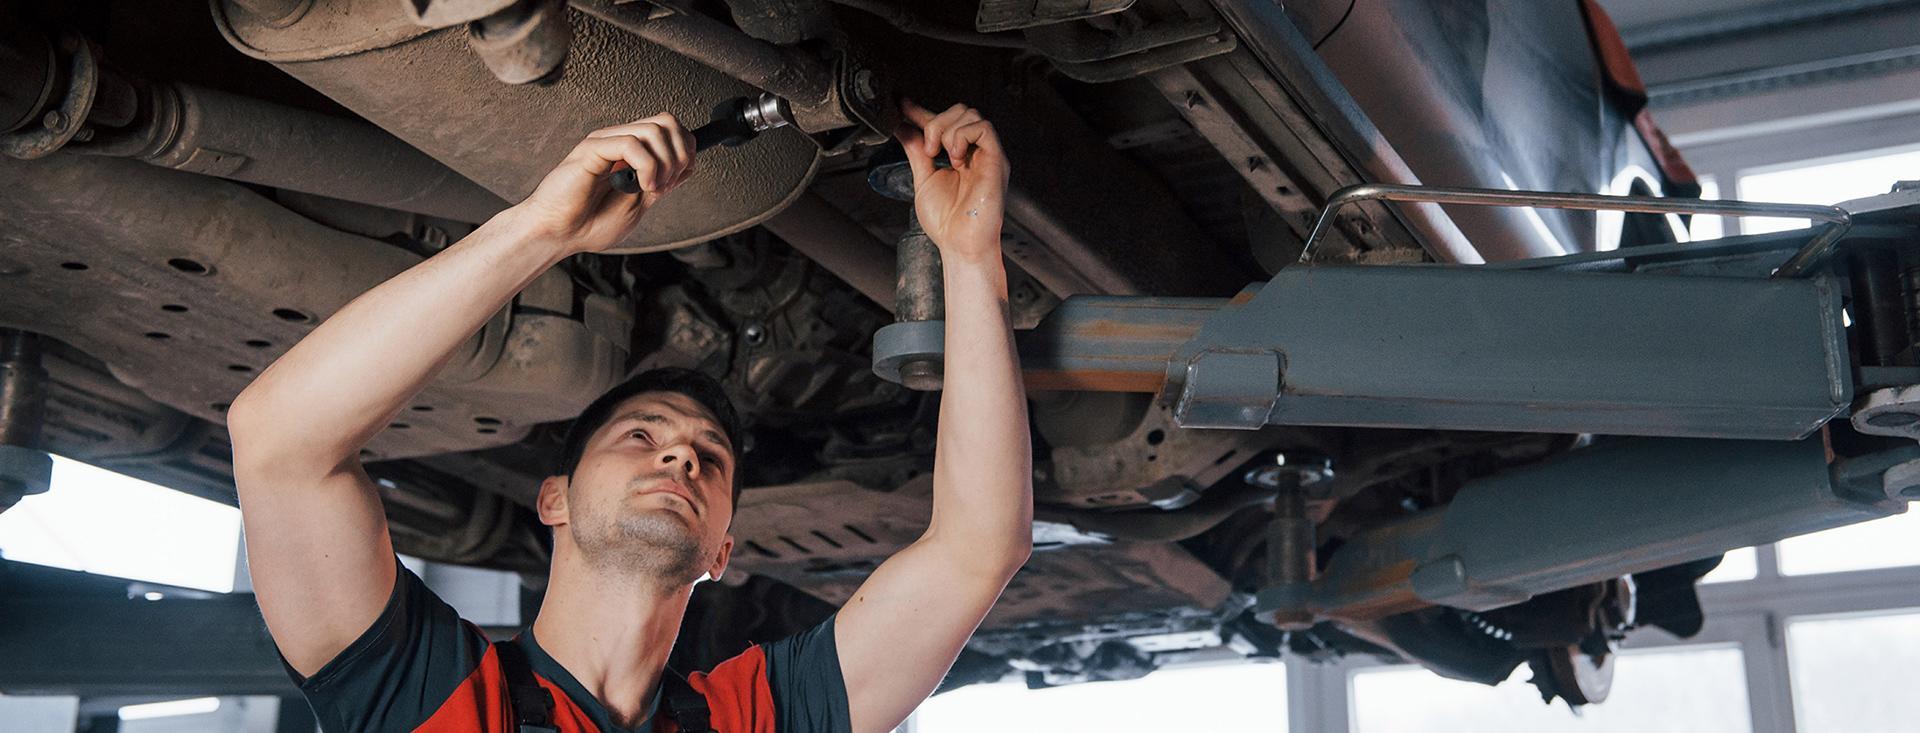 Service tech working on a Kia.